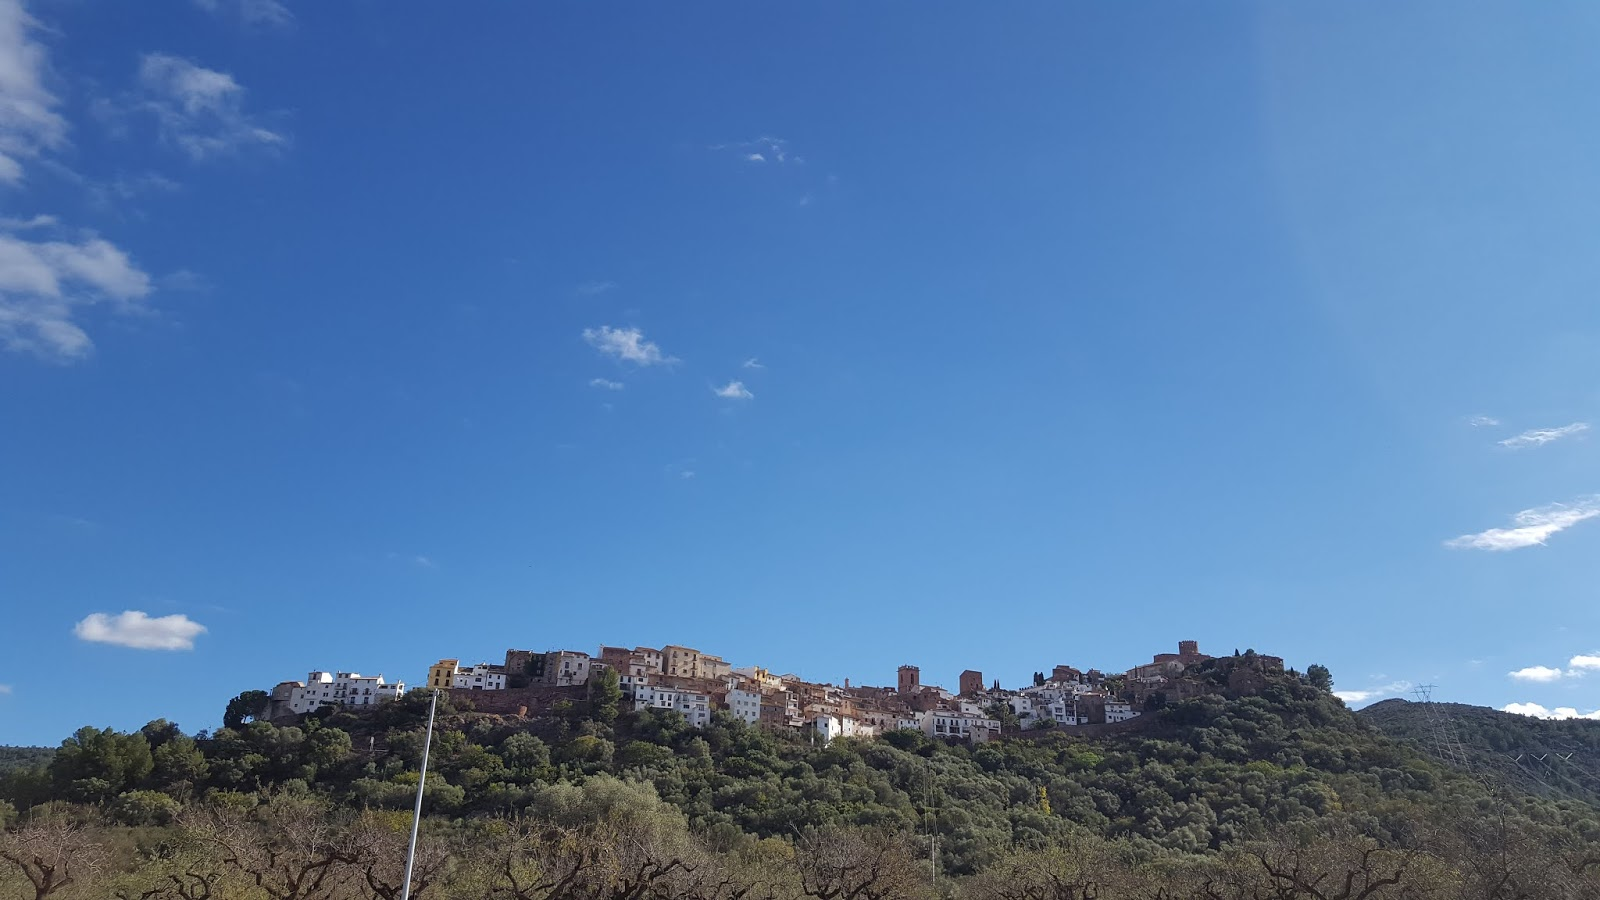 Villafamés, province of Castellón, Spain